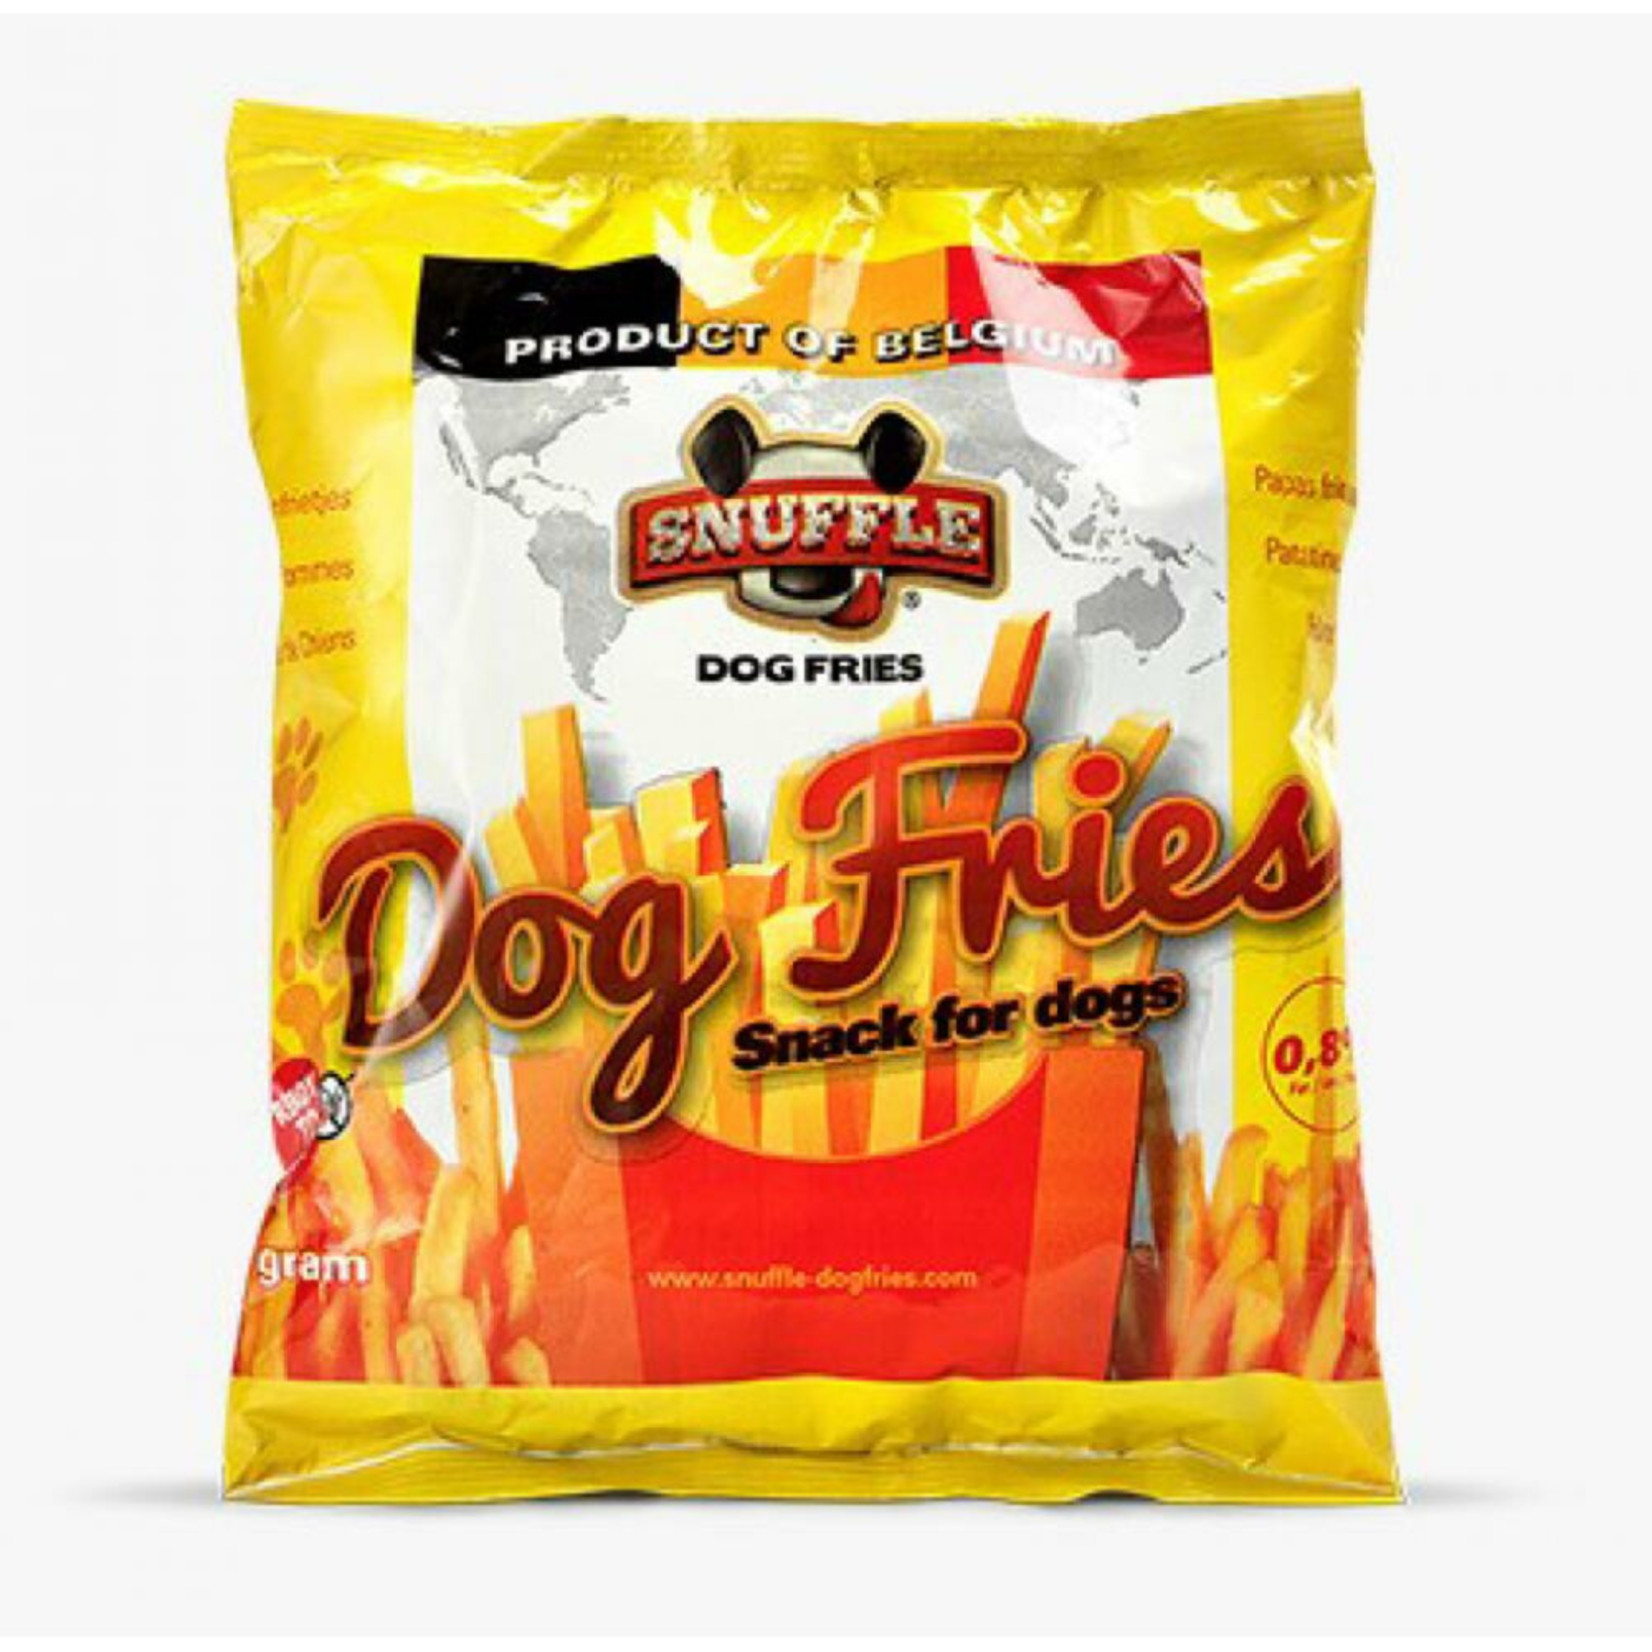 Snuffle Snuffle Fries